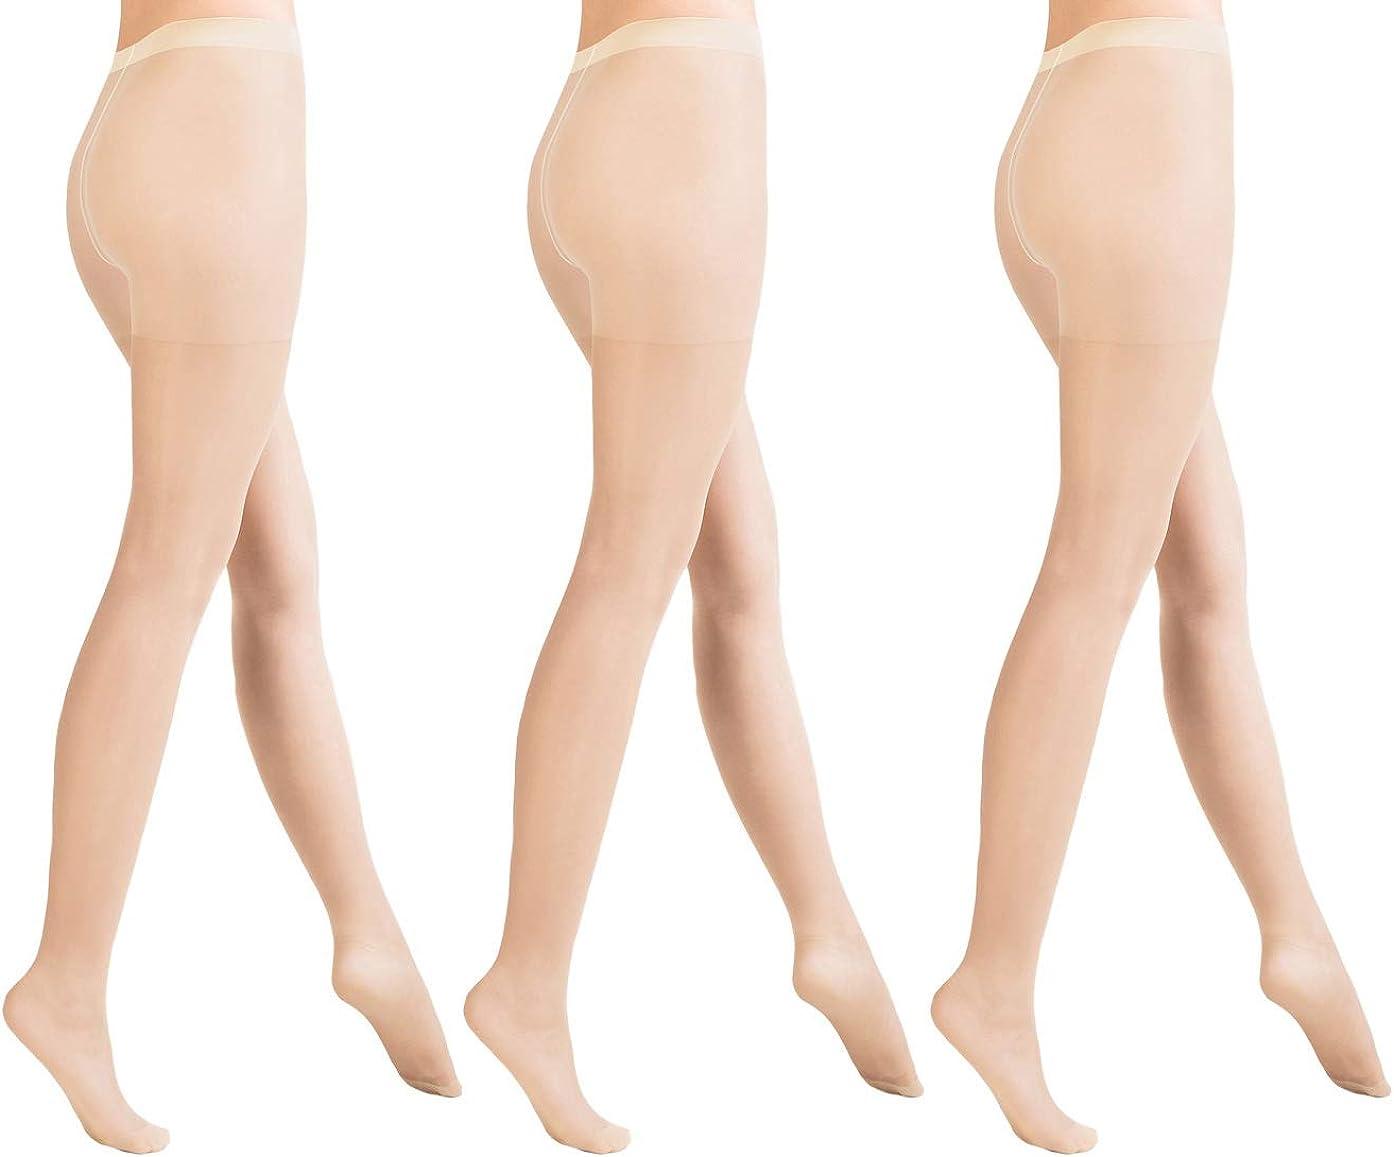 Aurellie Classic Lycra Sheer Plain 15 den Pantyhose (US sizes 4-16) packs of 3